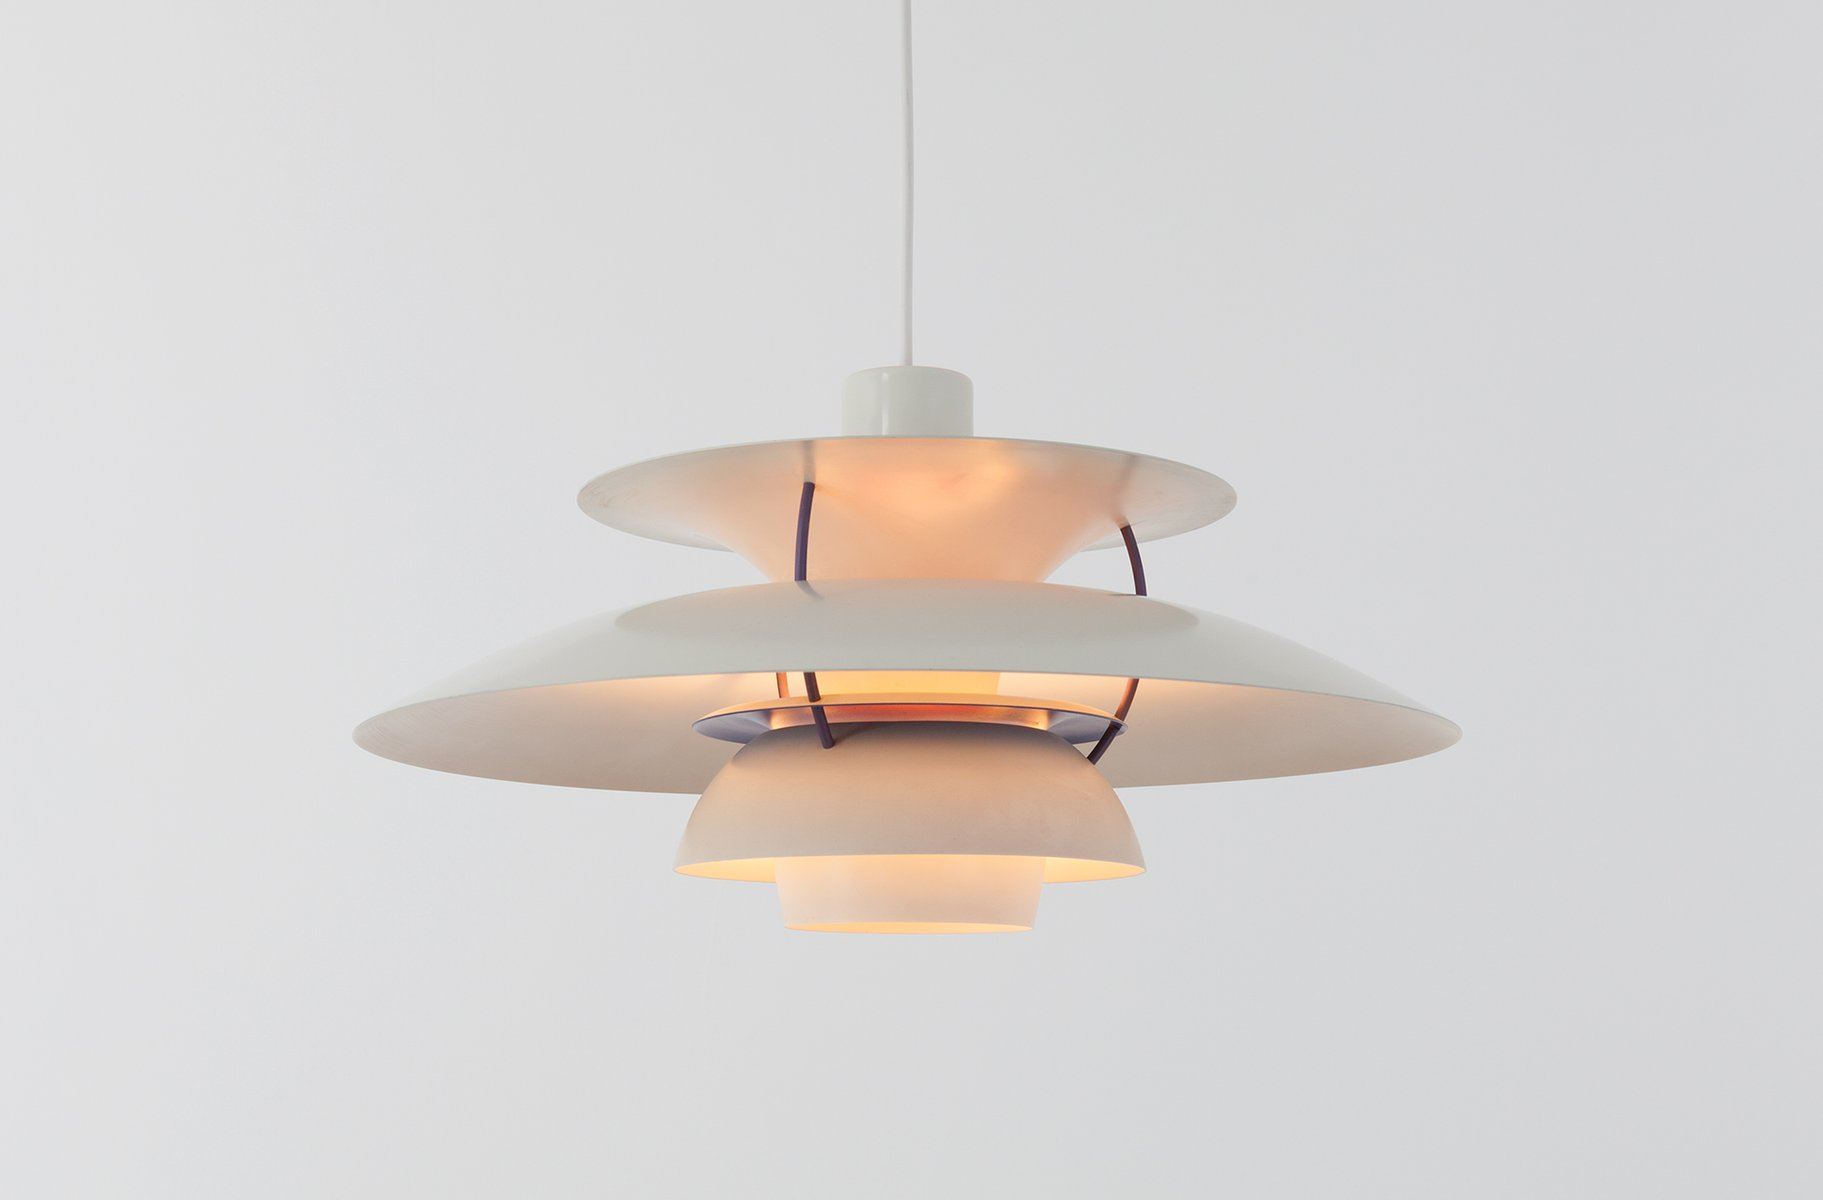 mid century ph 5 lamp by poul henningsen for louis poulsen. Black Bedroom Furniture Sets. Home Design Ideas